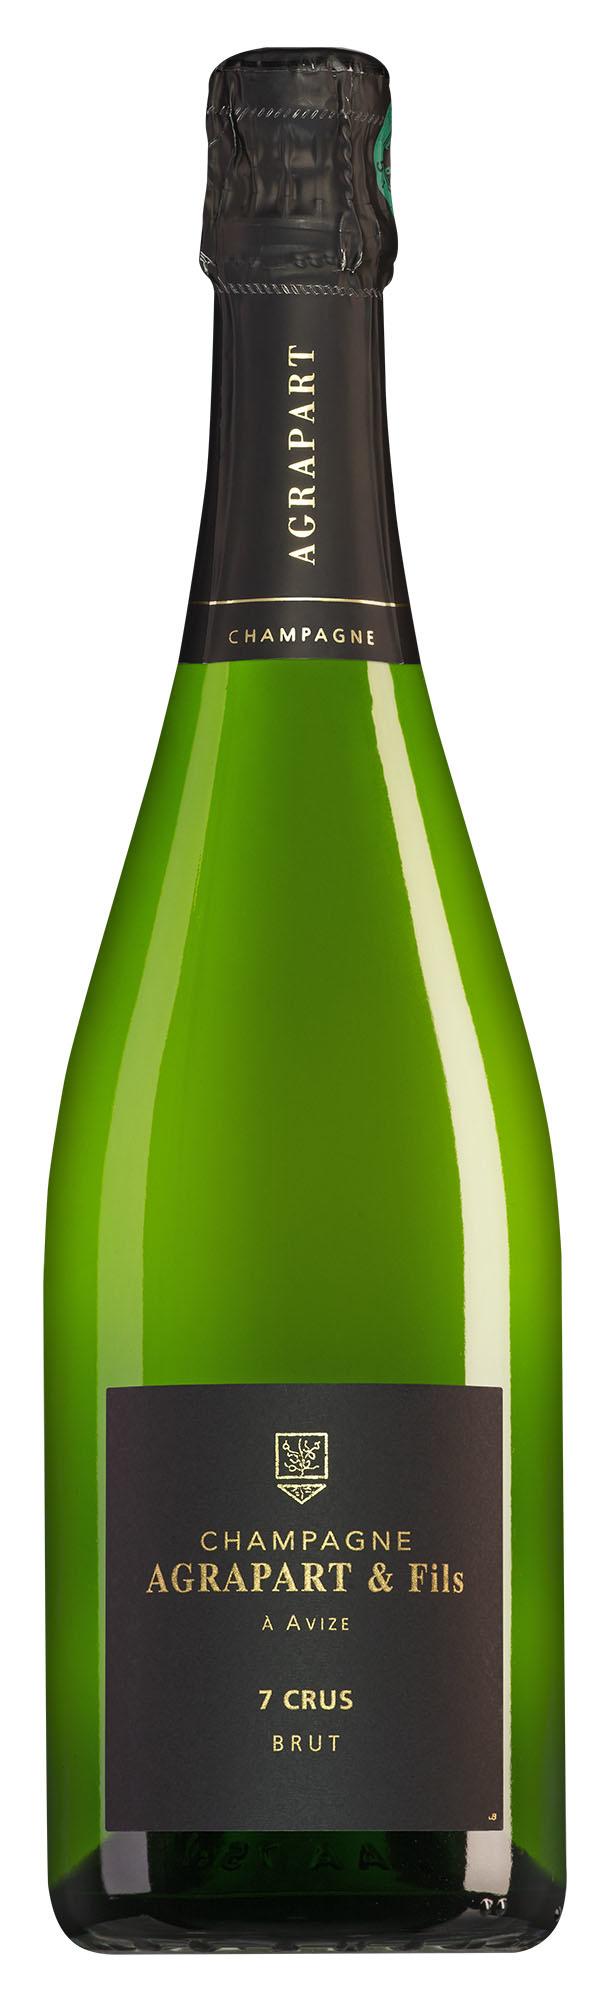 Agrapart Champagner Les 7 Crus Brut